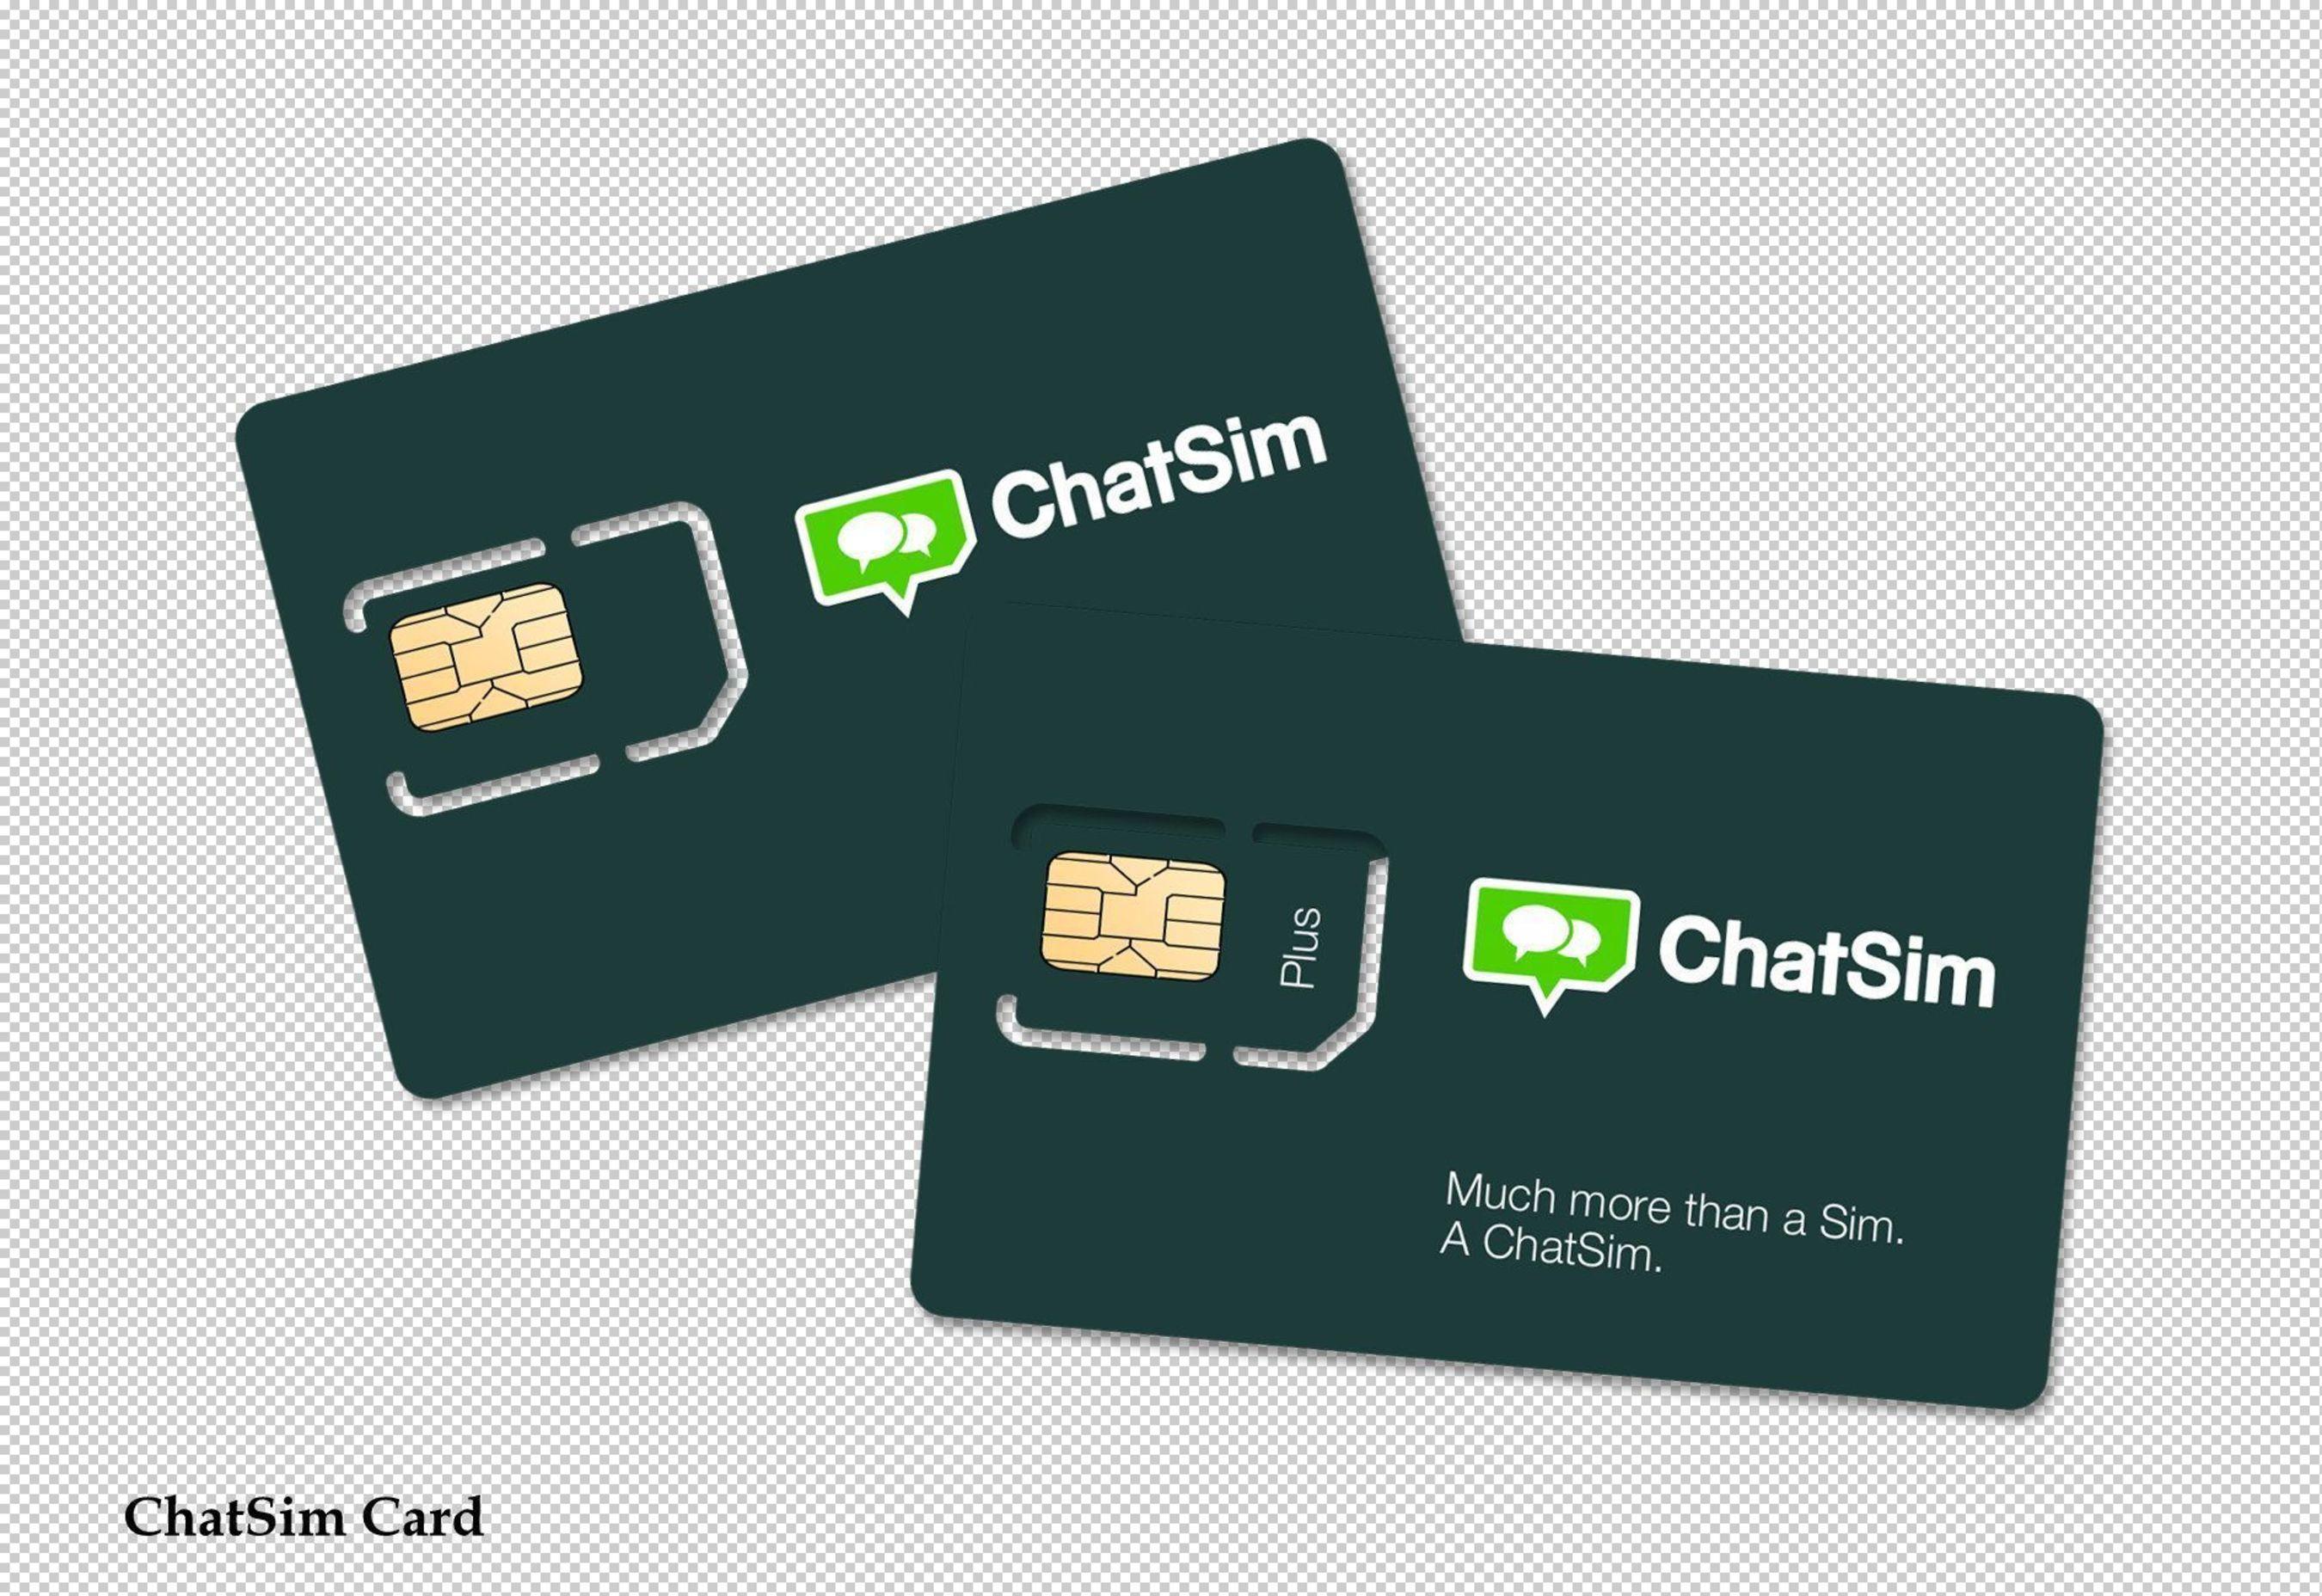 Crescimento da ChatSim: start-up da Zeromobile torna-se uma companhia independente; Angelsim